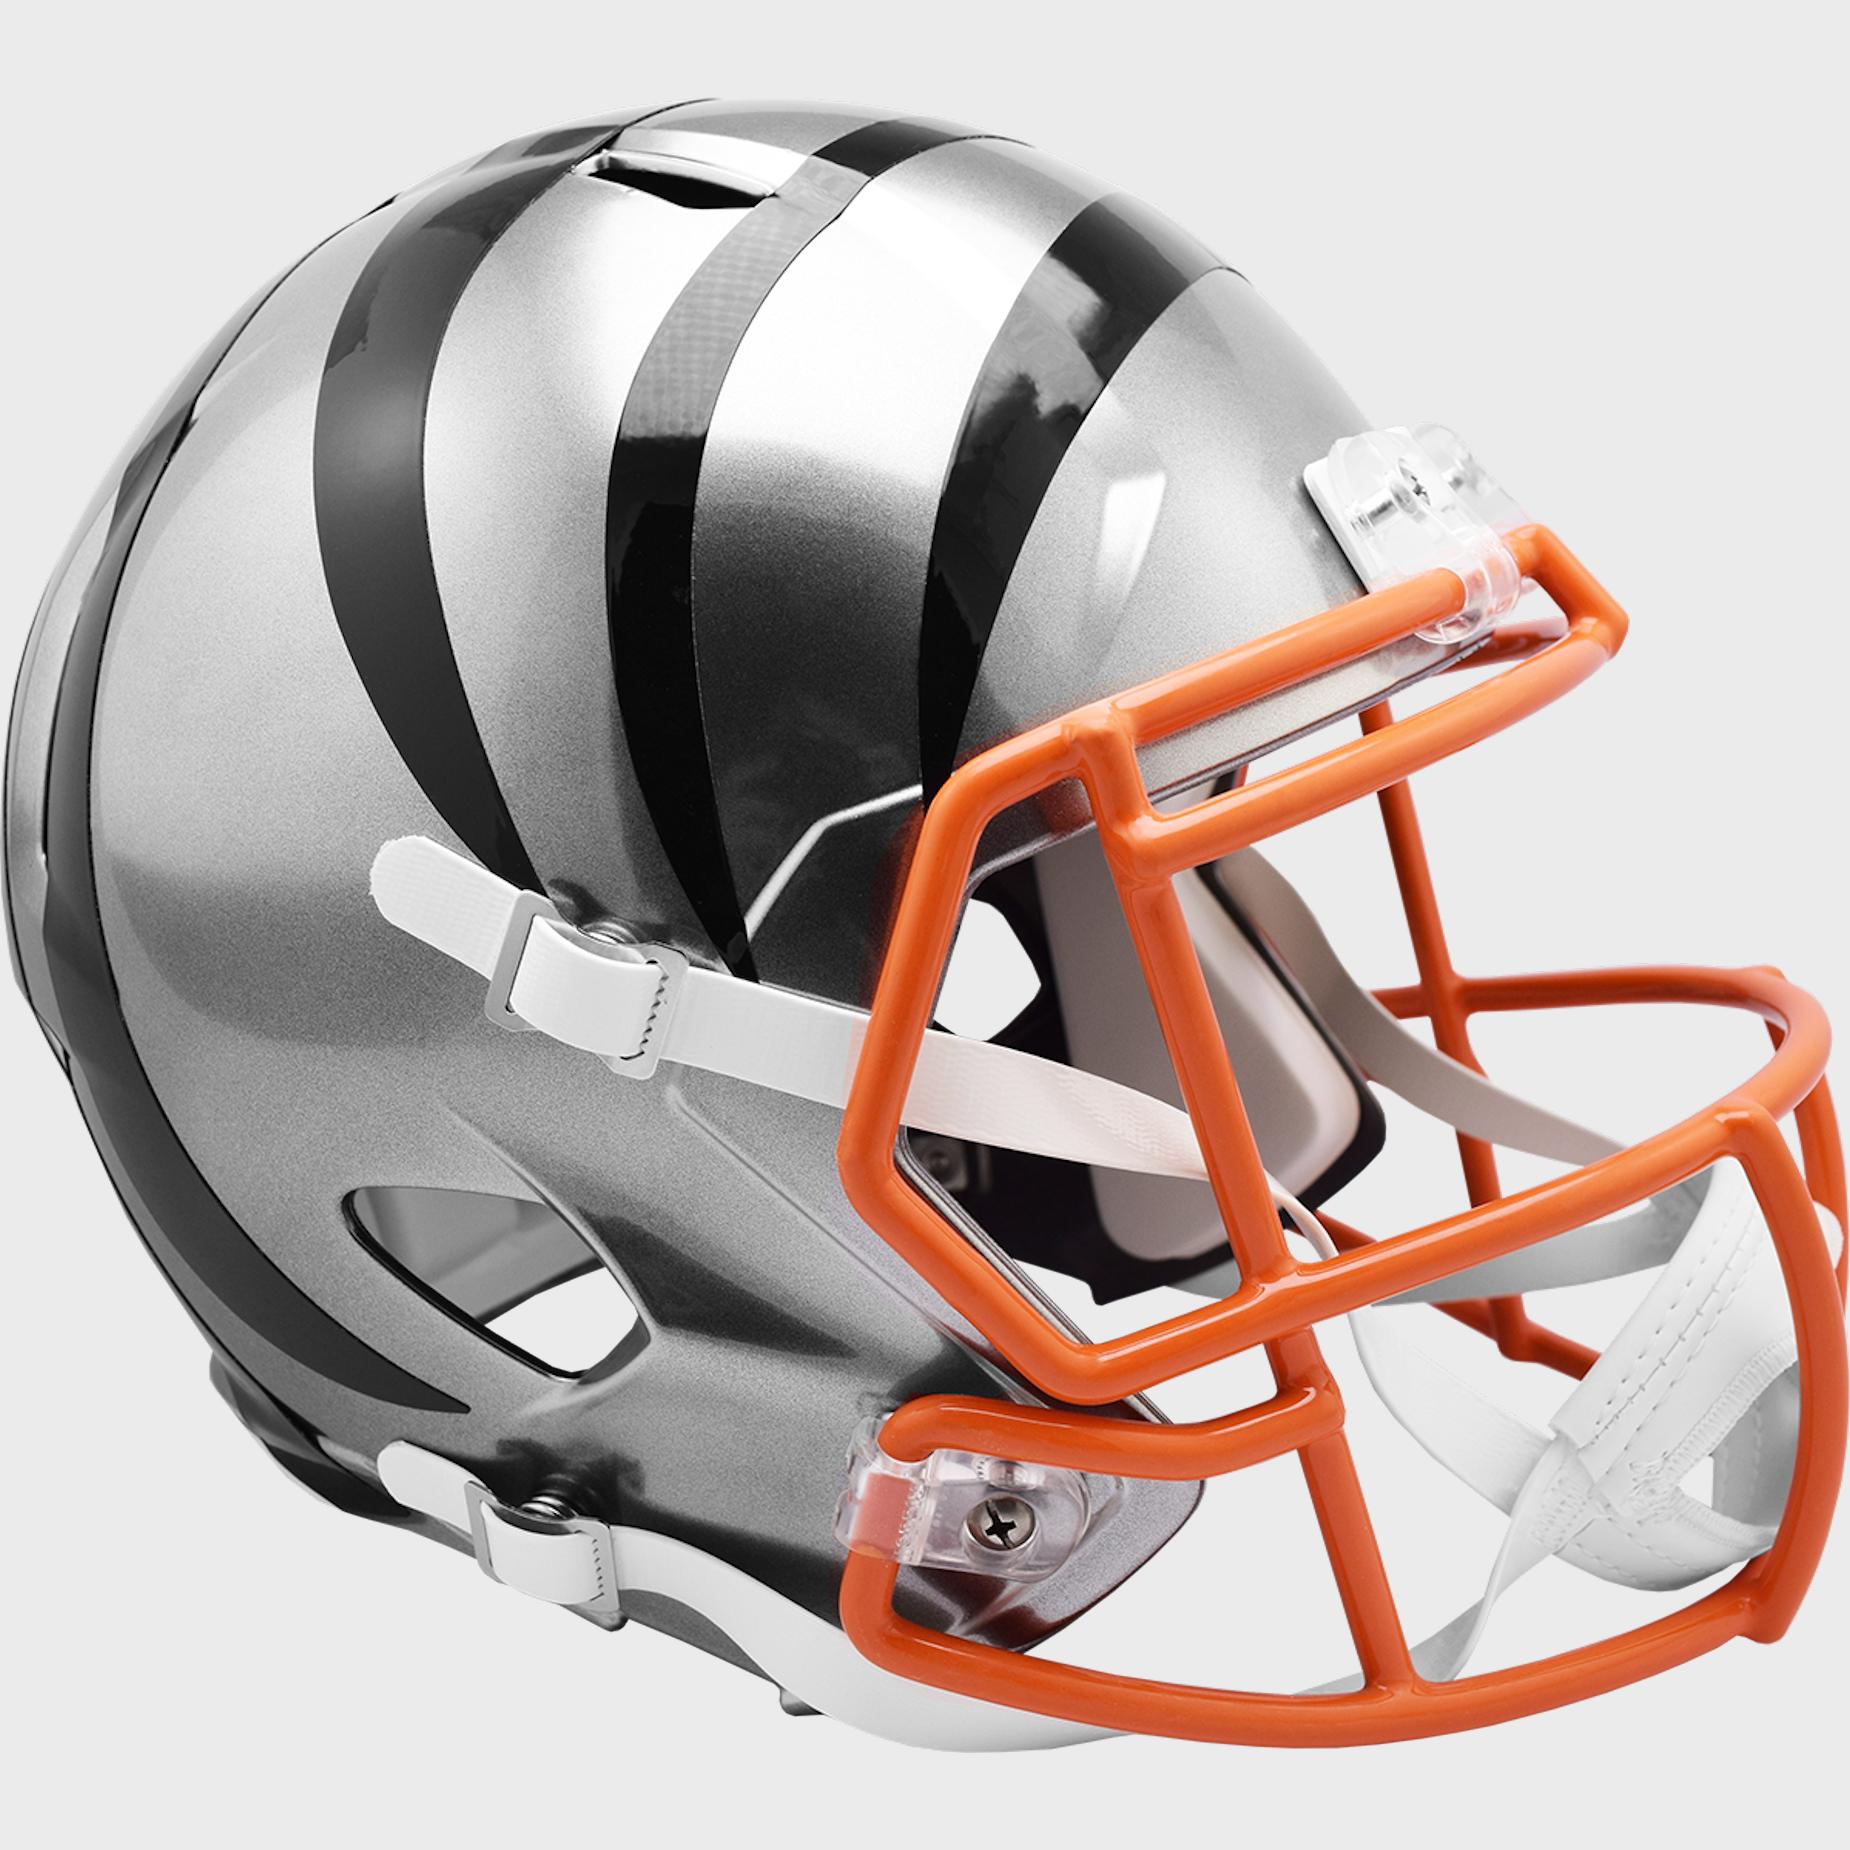 Cincinnati Bengals Speed Replica Football Helmet <B>FLASH ESD 8/21/21</B>